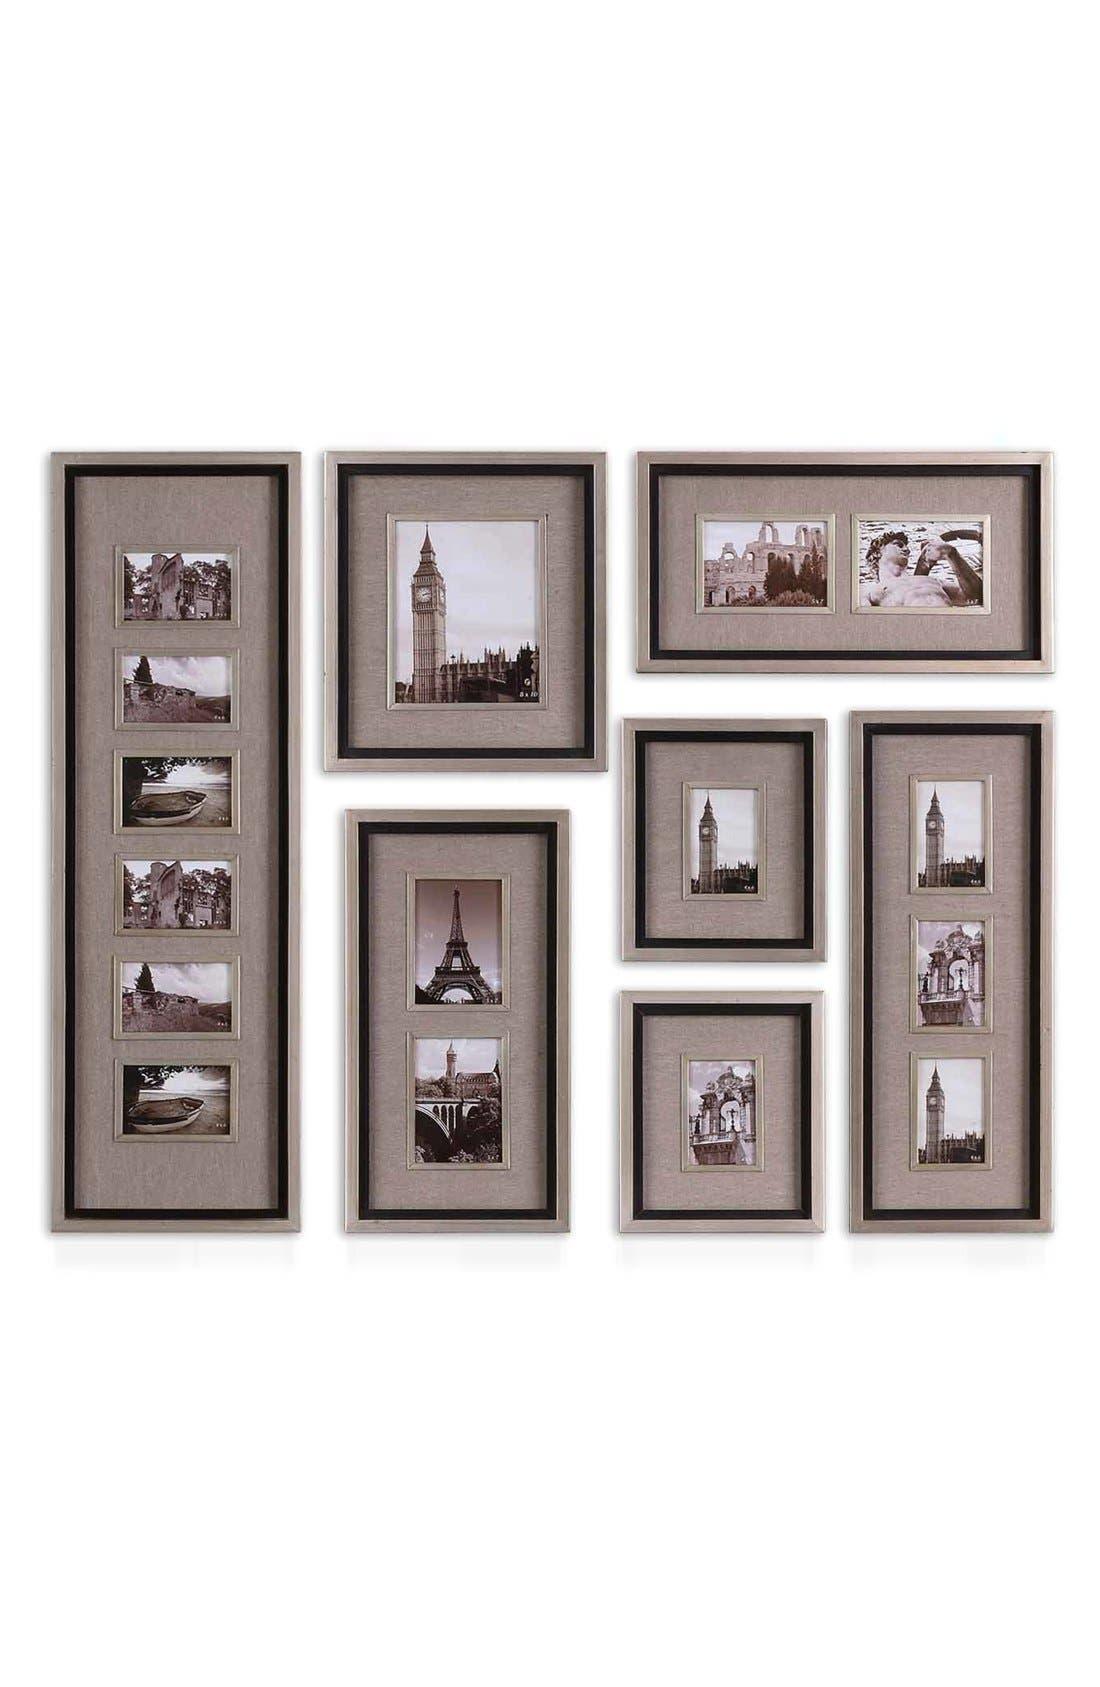 Uttermost Massena Set of 7 Picture Frames